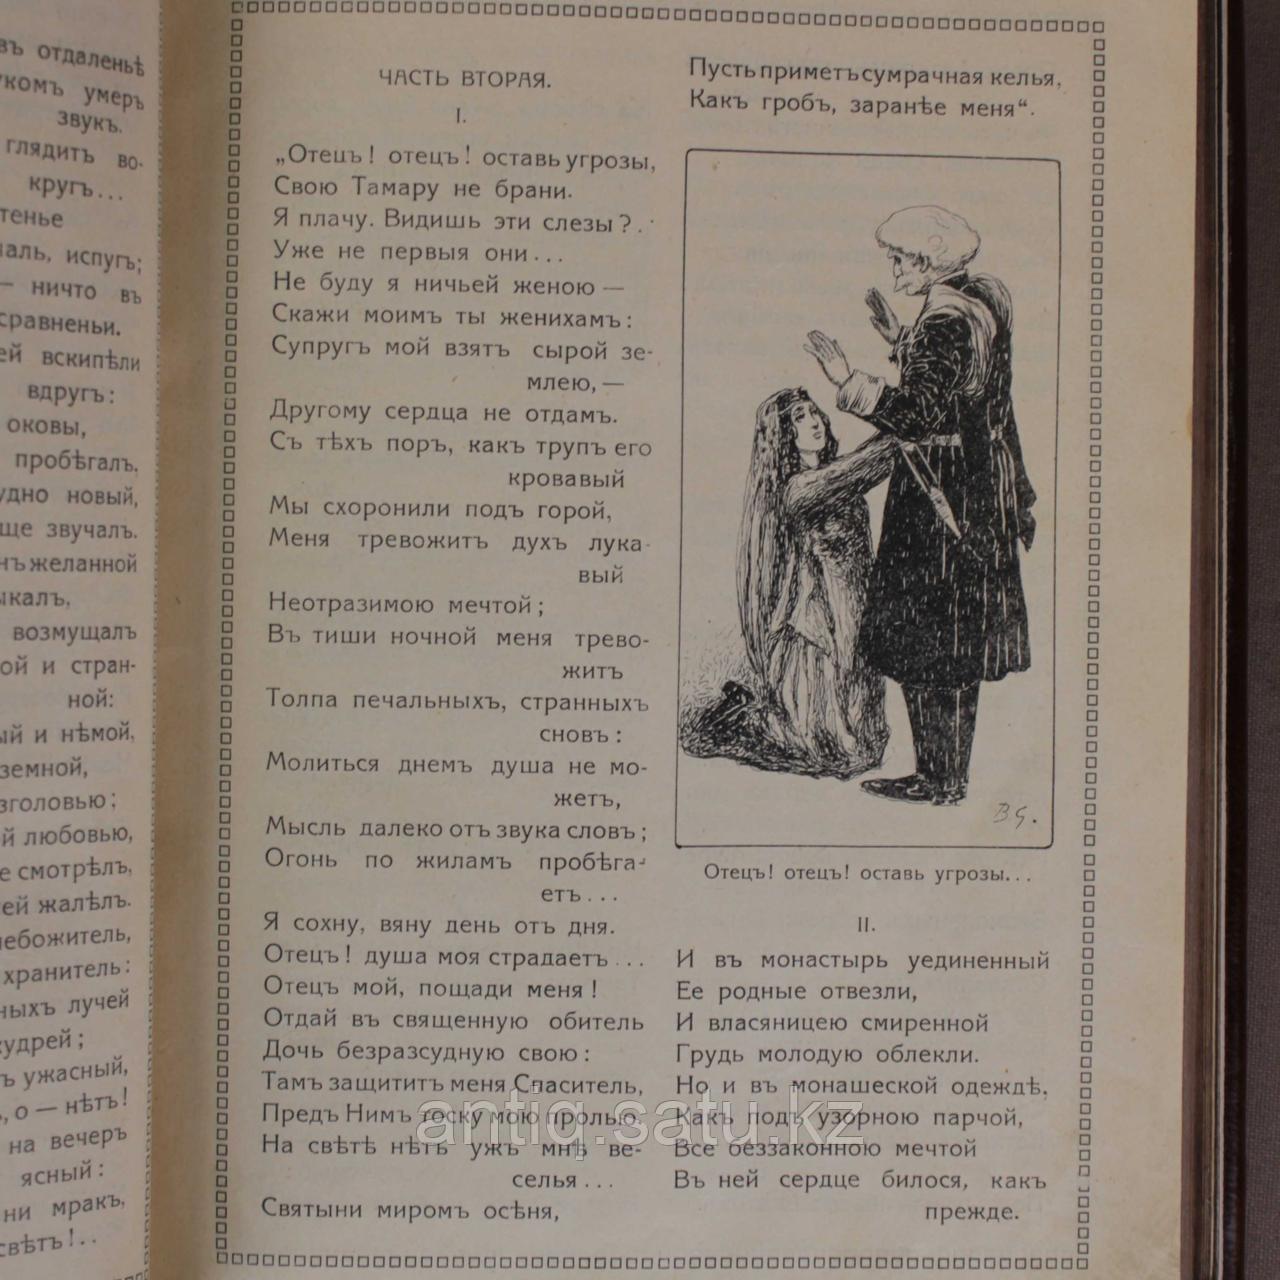 Произведения Михаила Юрьевича Лермонтова - фото 6